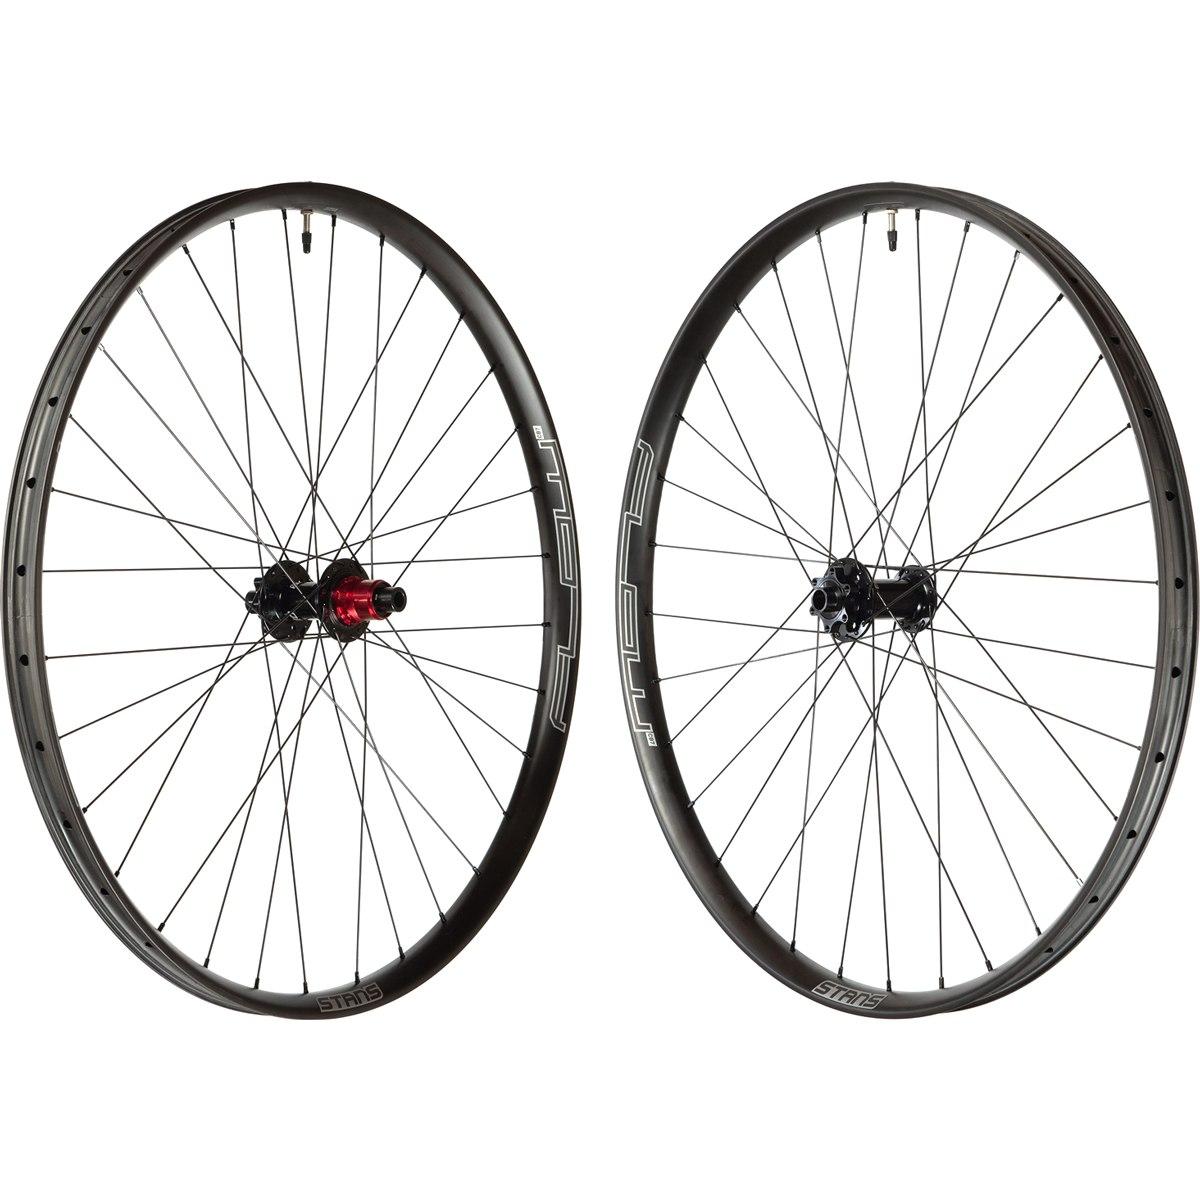 Stan's NoTubes ZTR Flow CB7 29 Inch Neo Wheelset - FW: 15x110mm | RW: 12x148mm Boost - SRAM XD